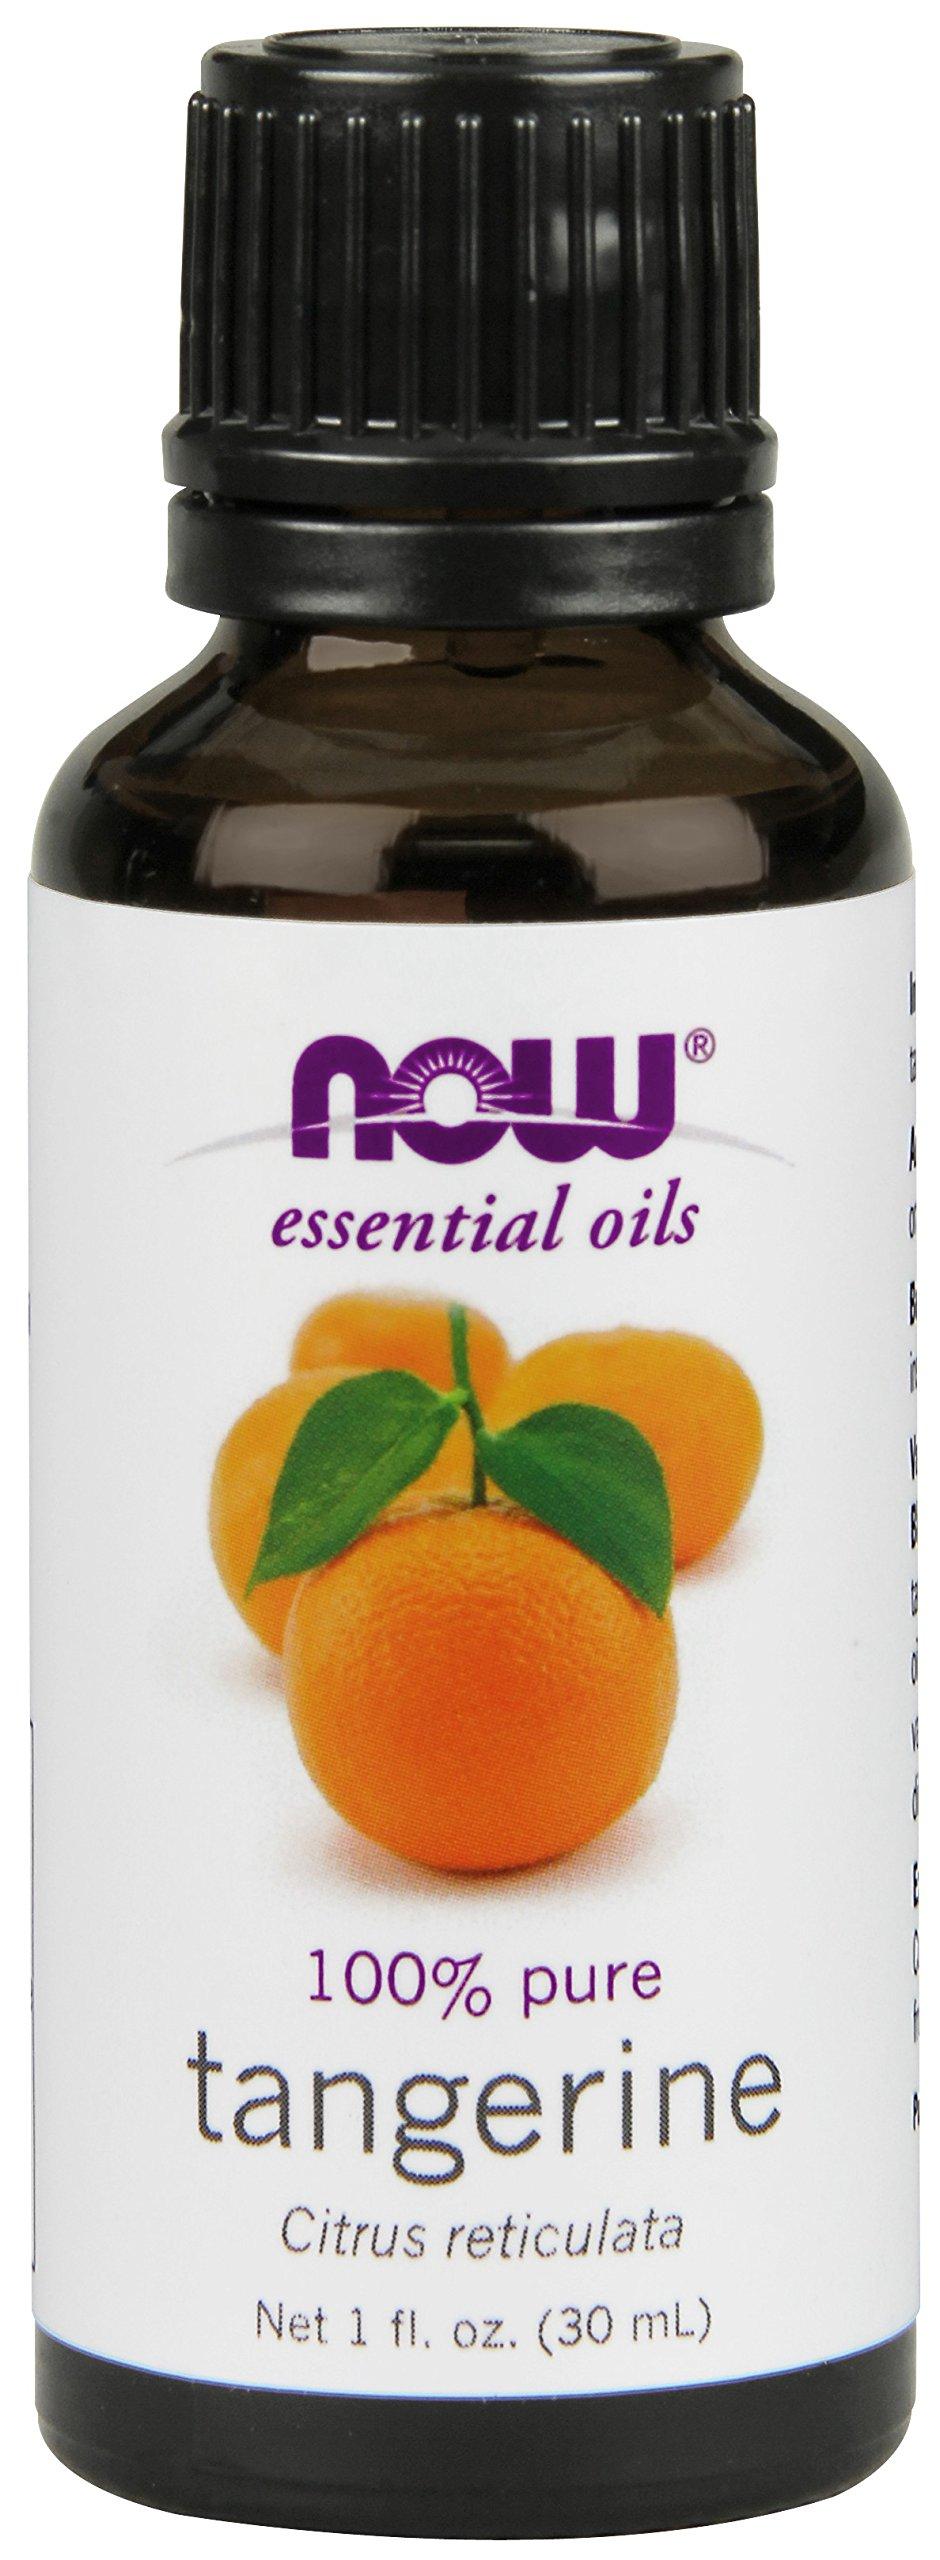 NOW  Tangerine Oil, 1-Ounce